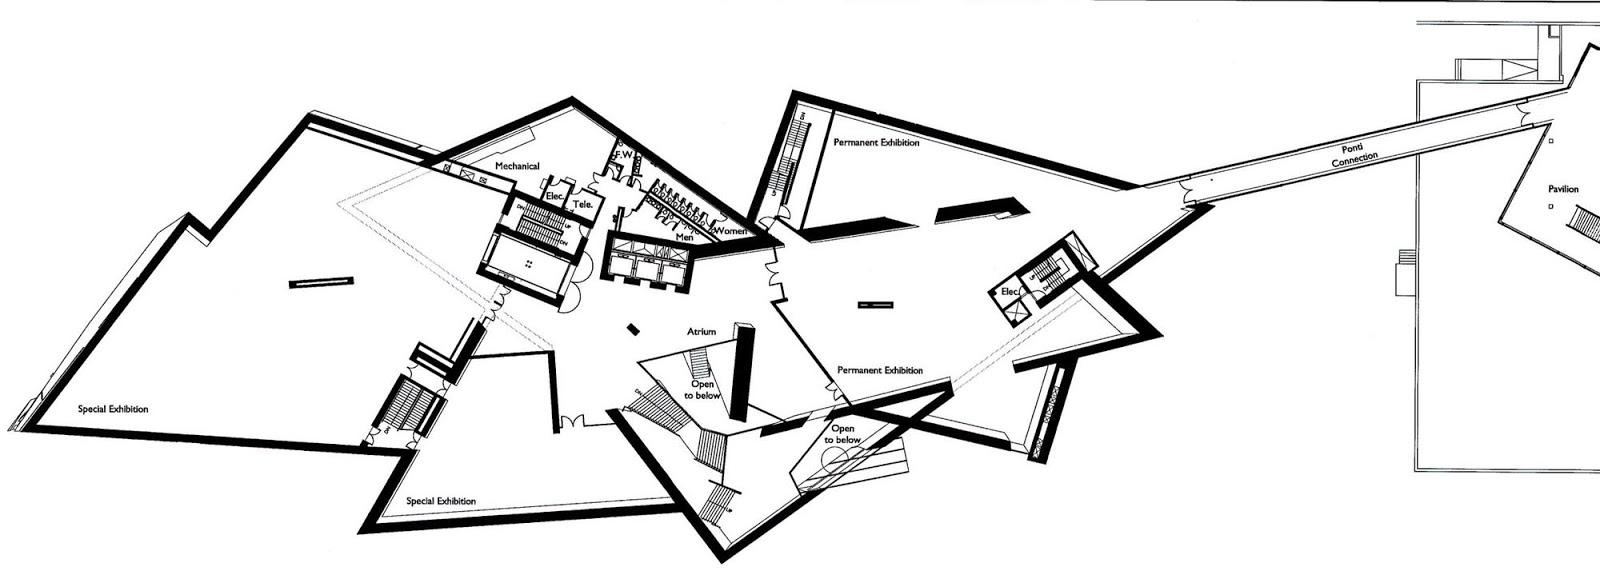 Arch1101 2013 jacky yuen daniel libeskind for Second floor design plans